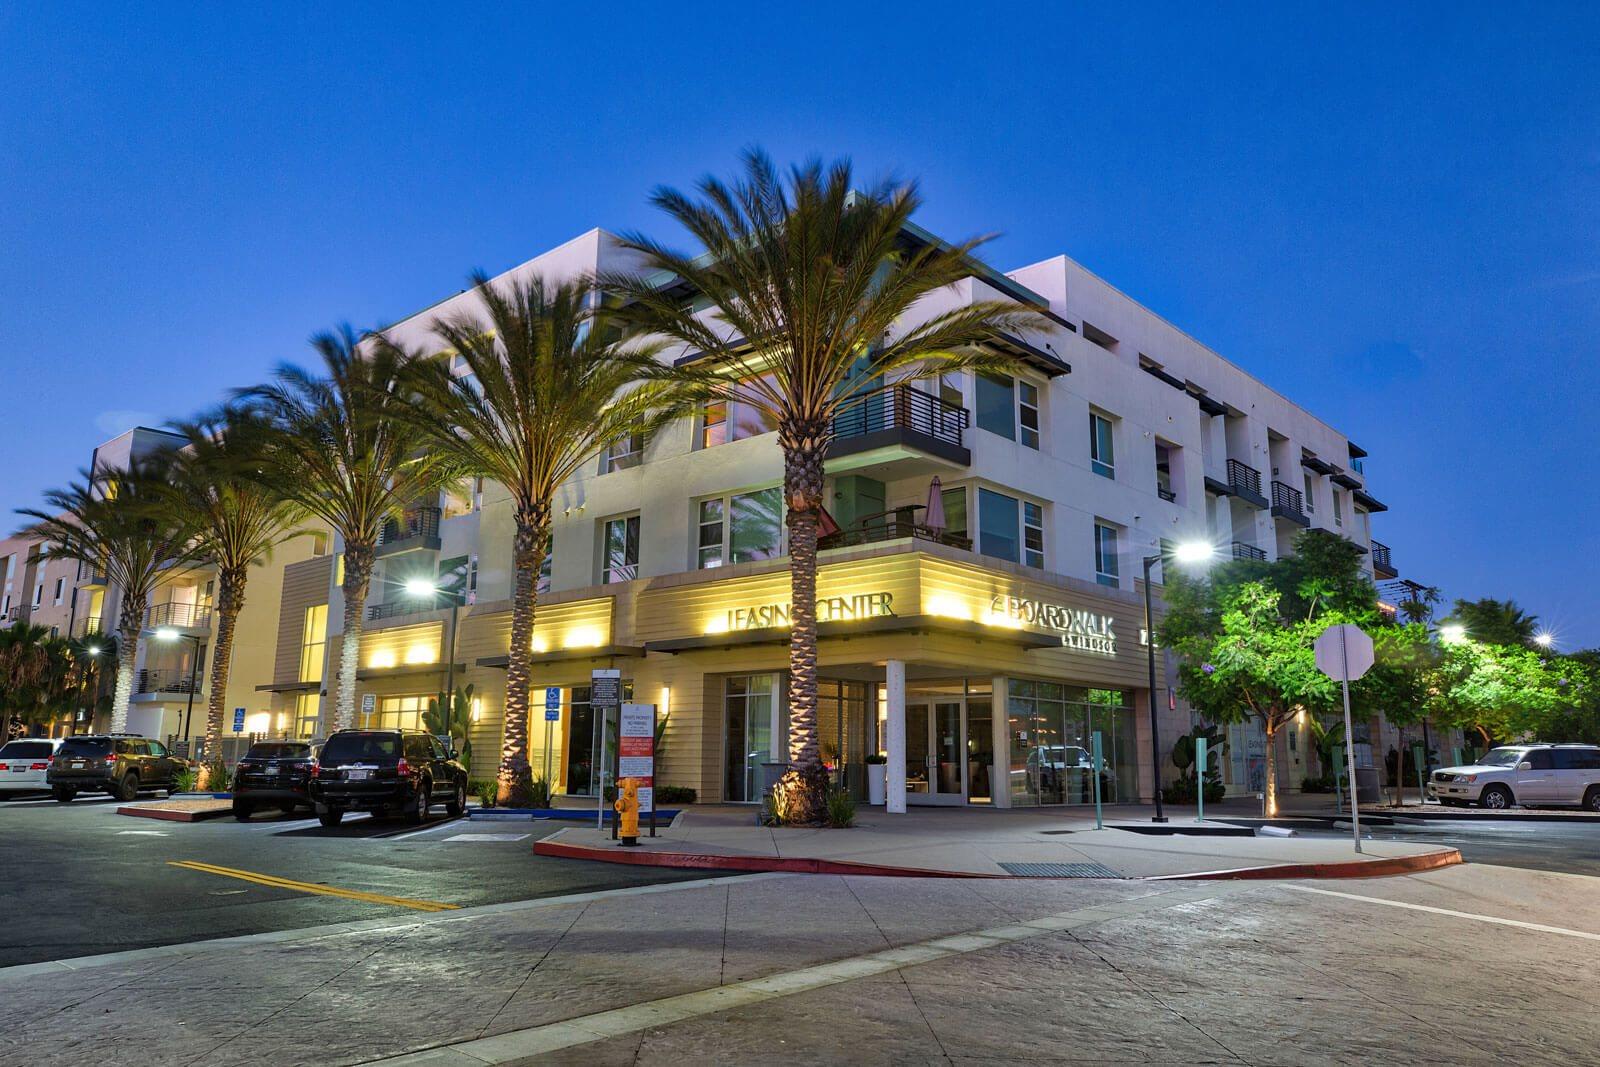 Street View of Building at Boardwalk by Windsor, Huntington Beach, California